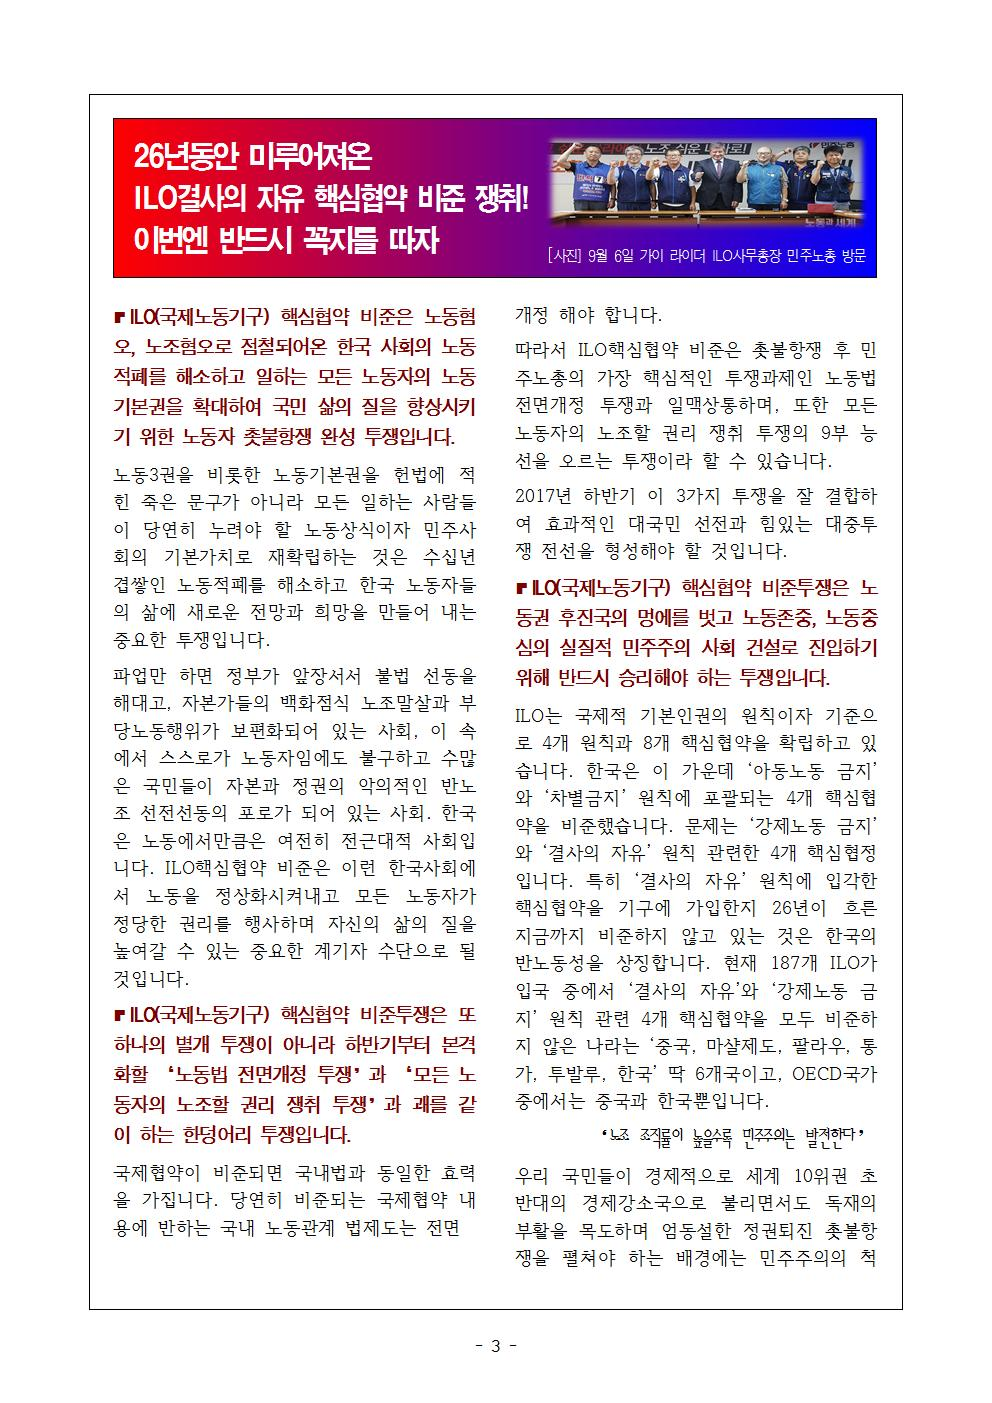 ilo현장교육지003.jpg